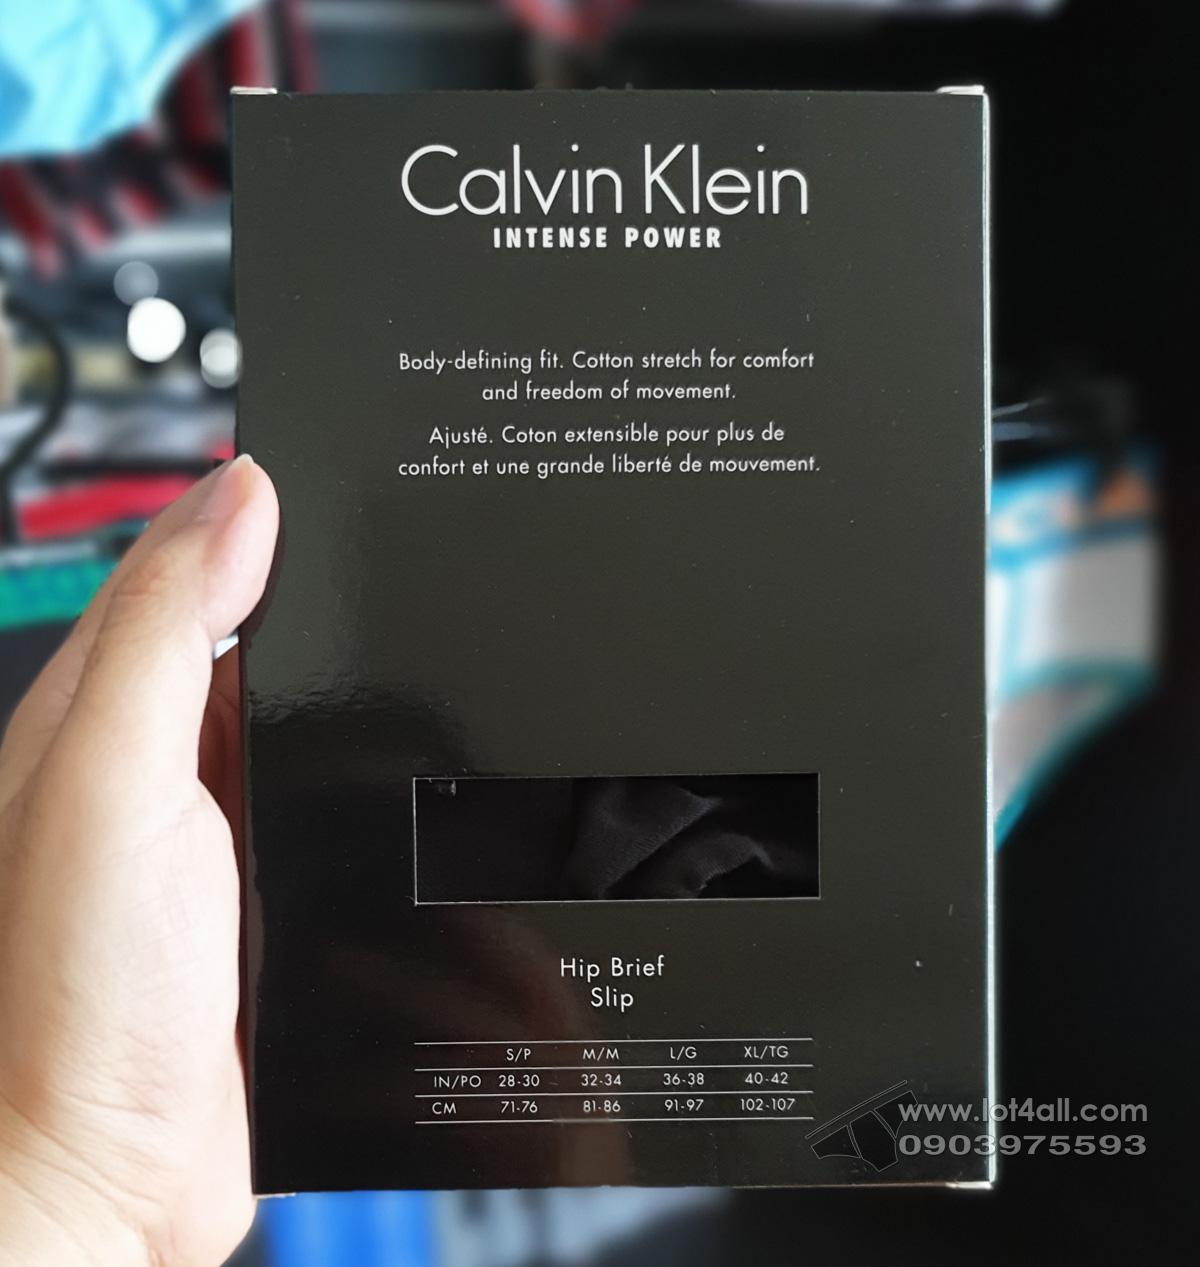 Quần lót nam Calvin Klein NB1040 Intense Power Cotton Hip Brief Black